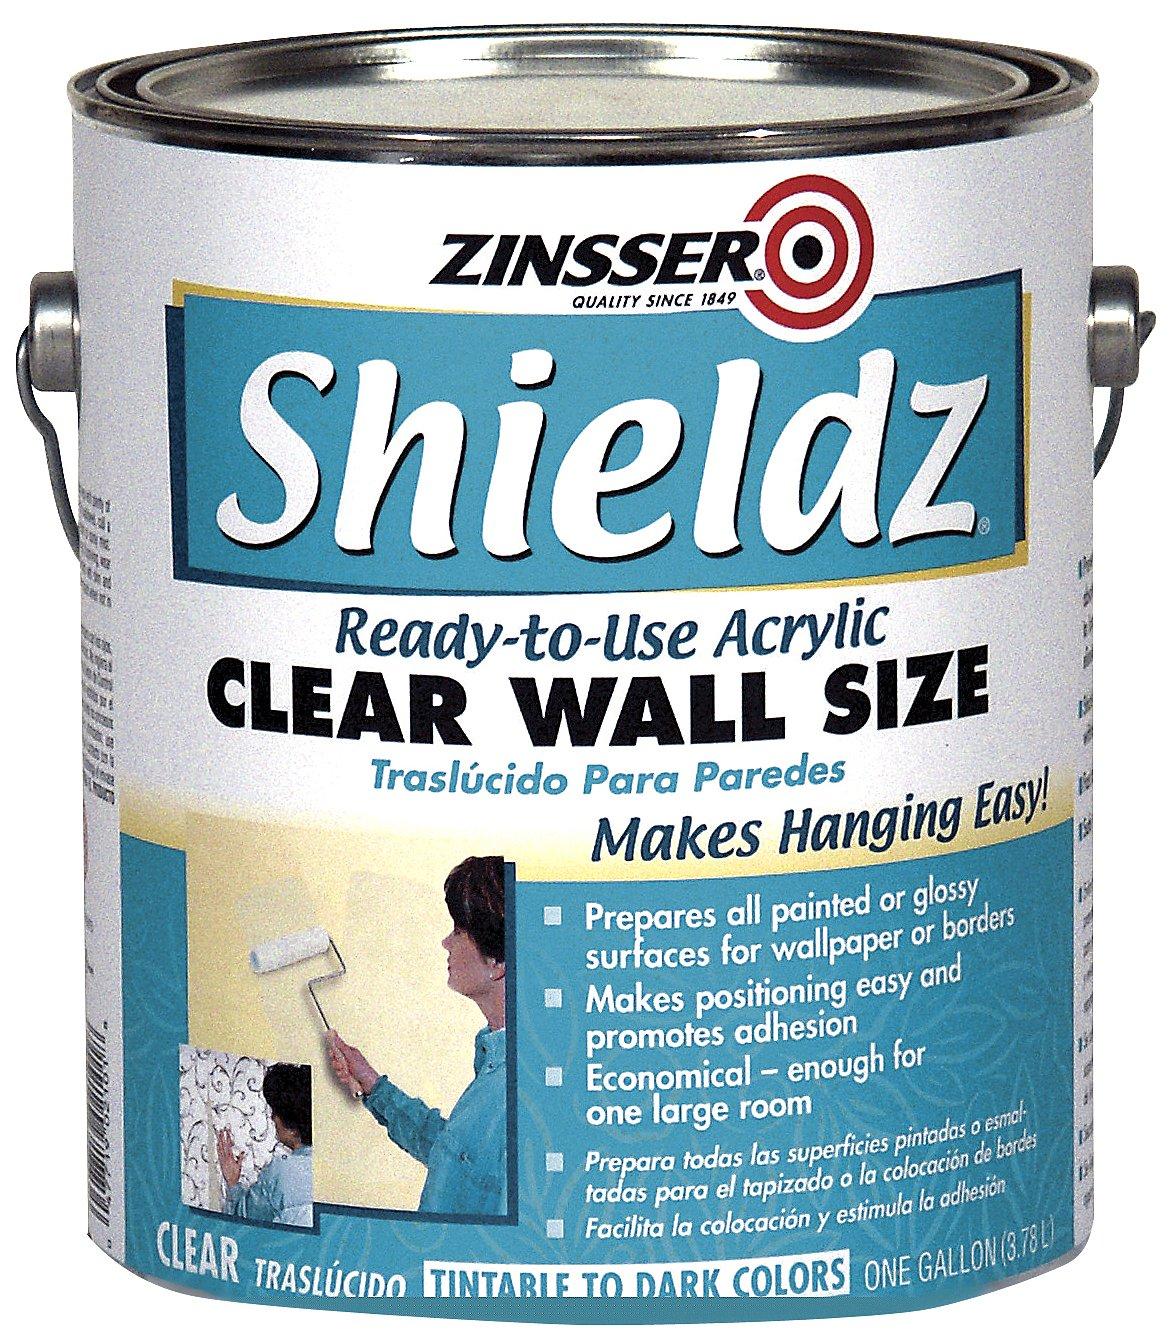 Rust-Oleum Corporation 02101 Zinsser Shieldz Wall Size, 1-Gallon, Clear